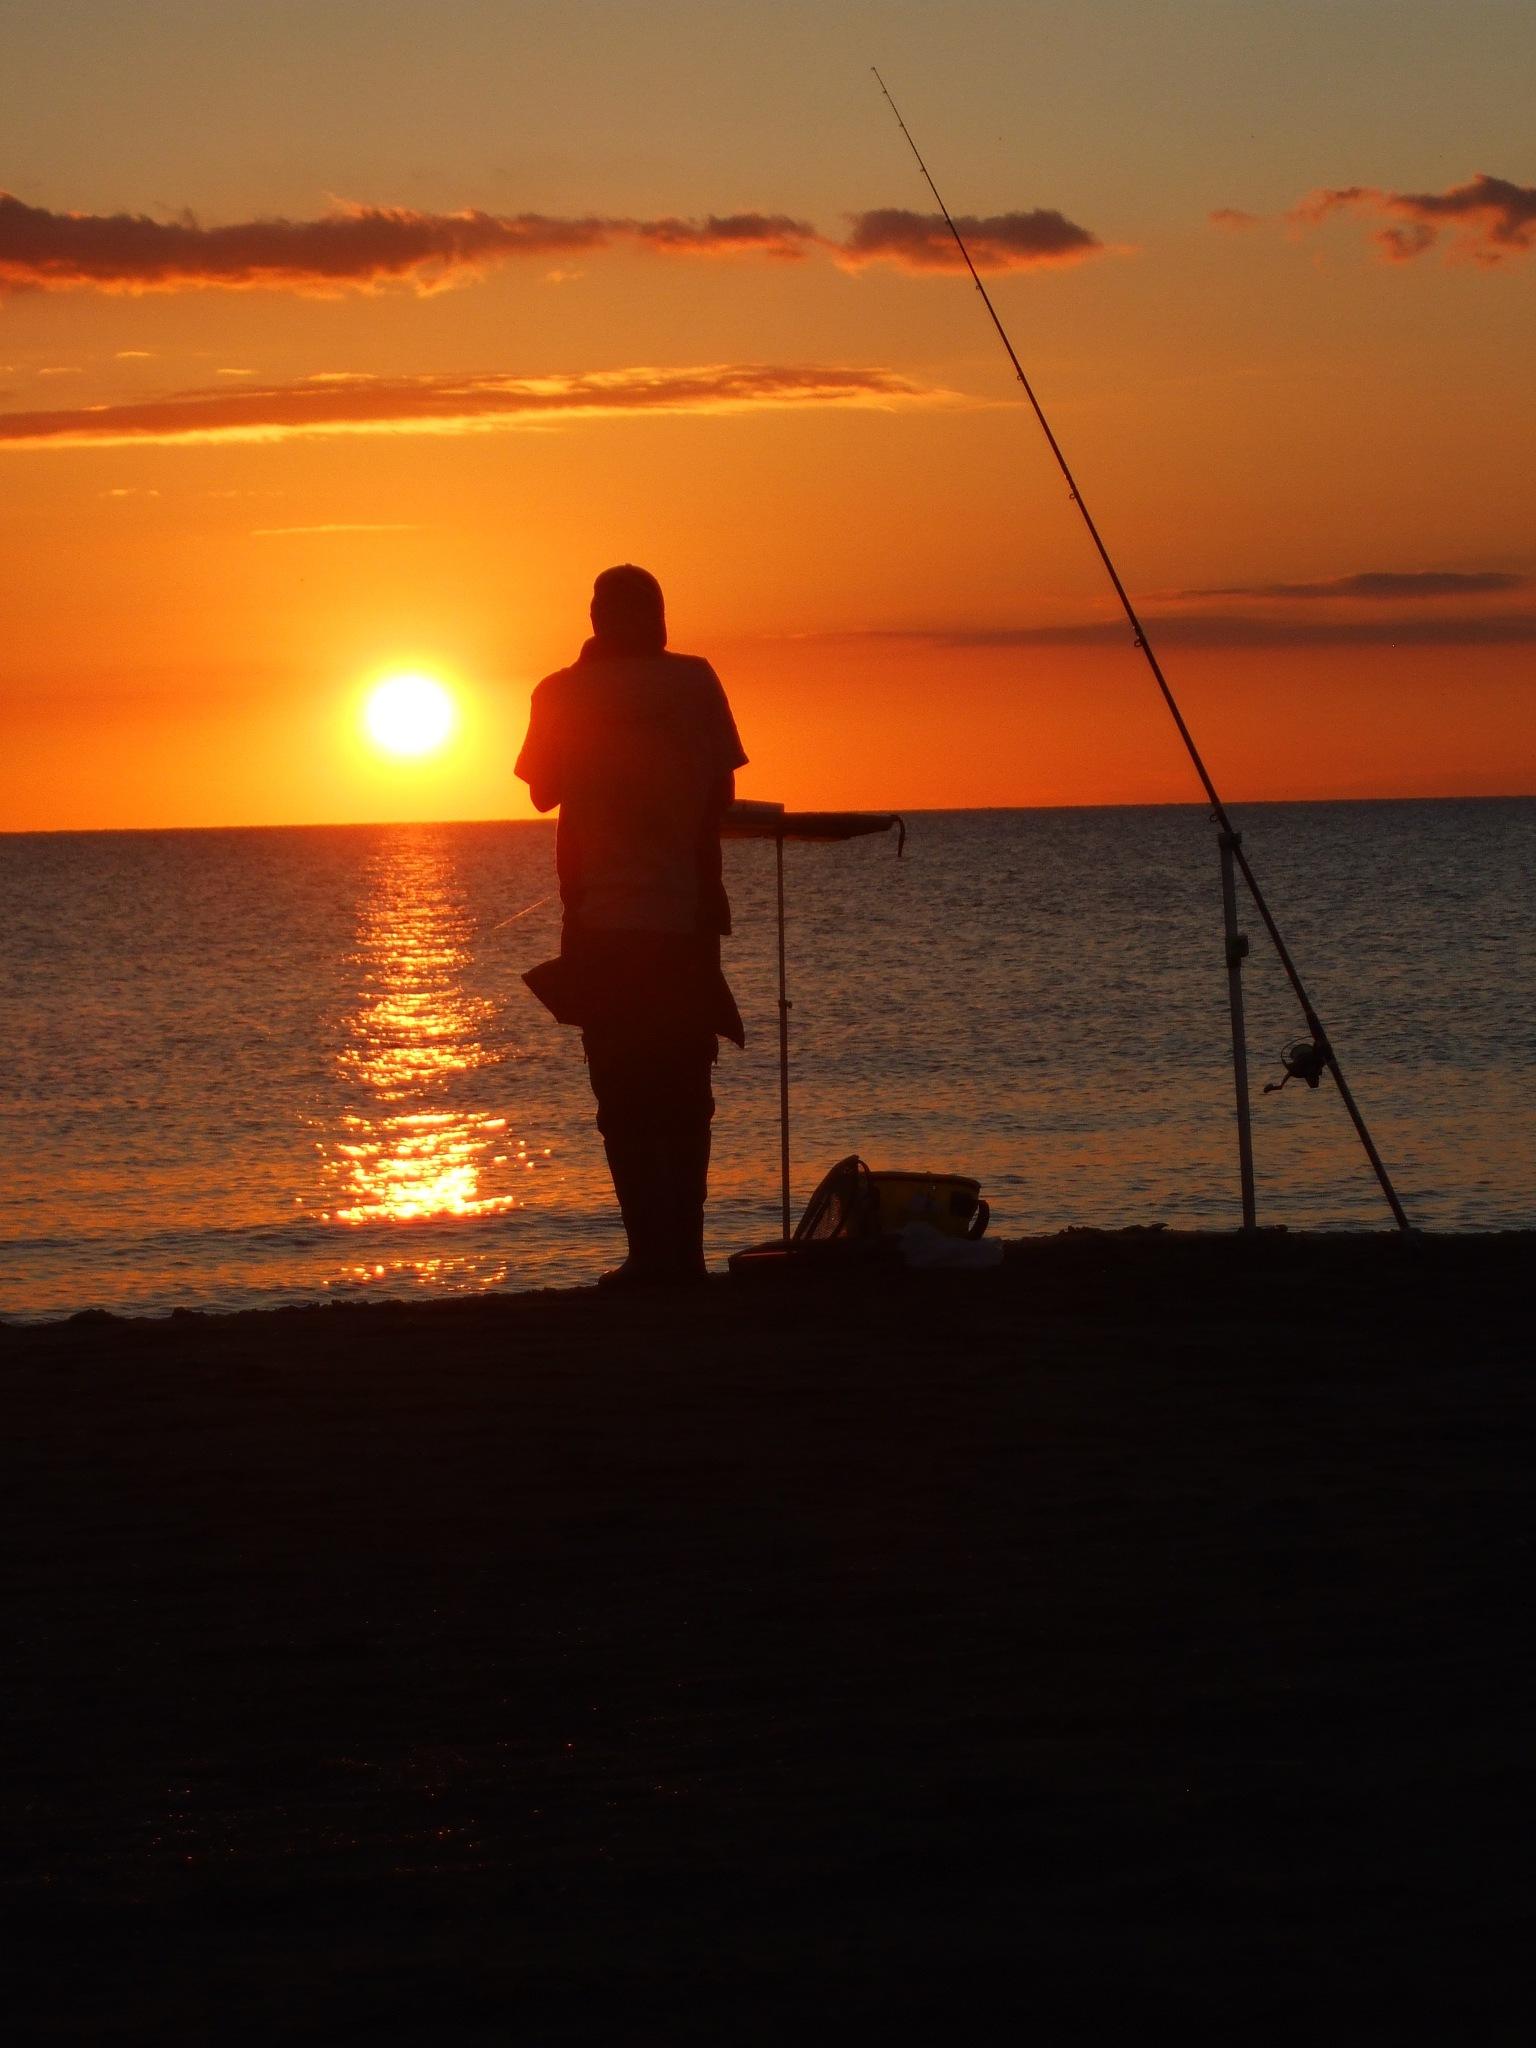 Pescatore by Salvatore Bertolino